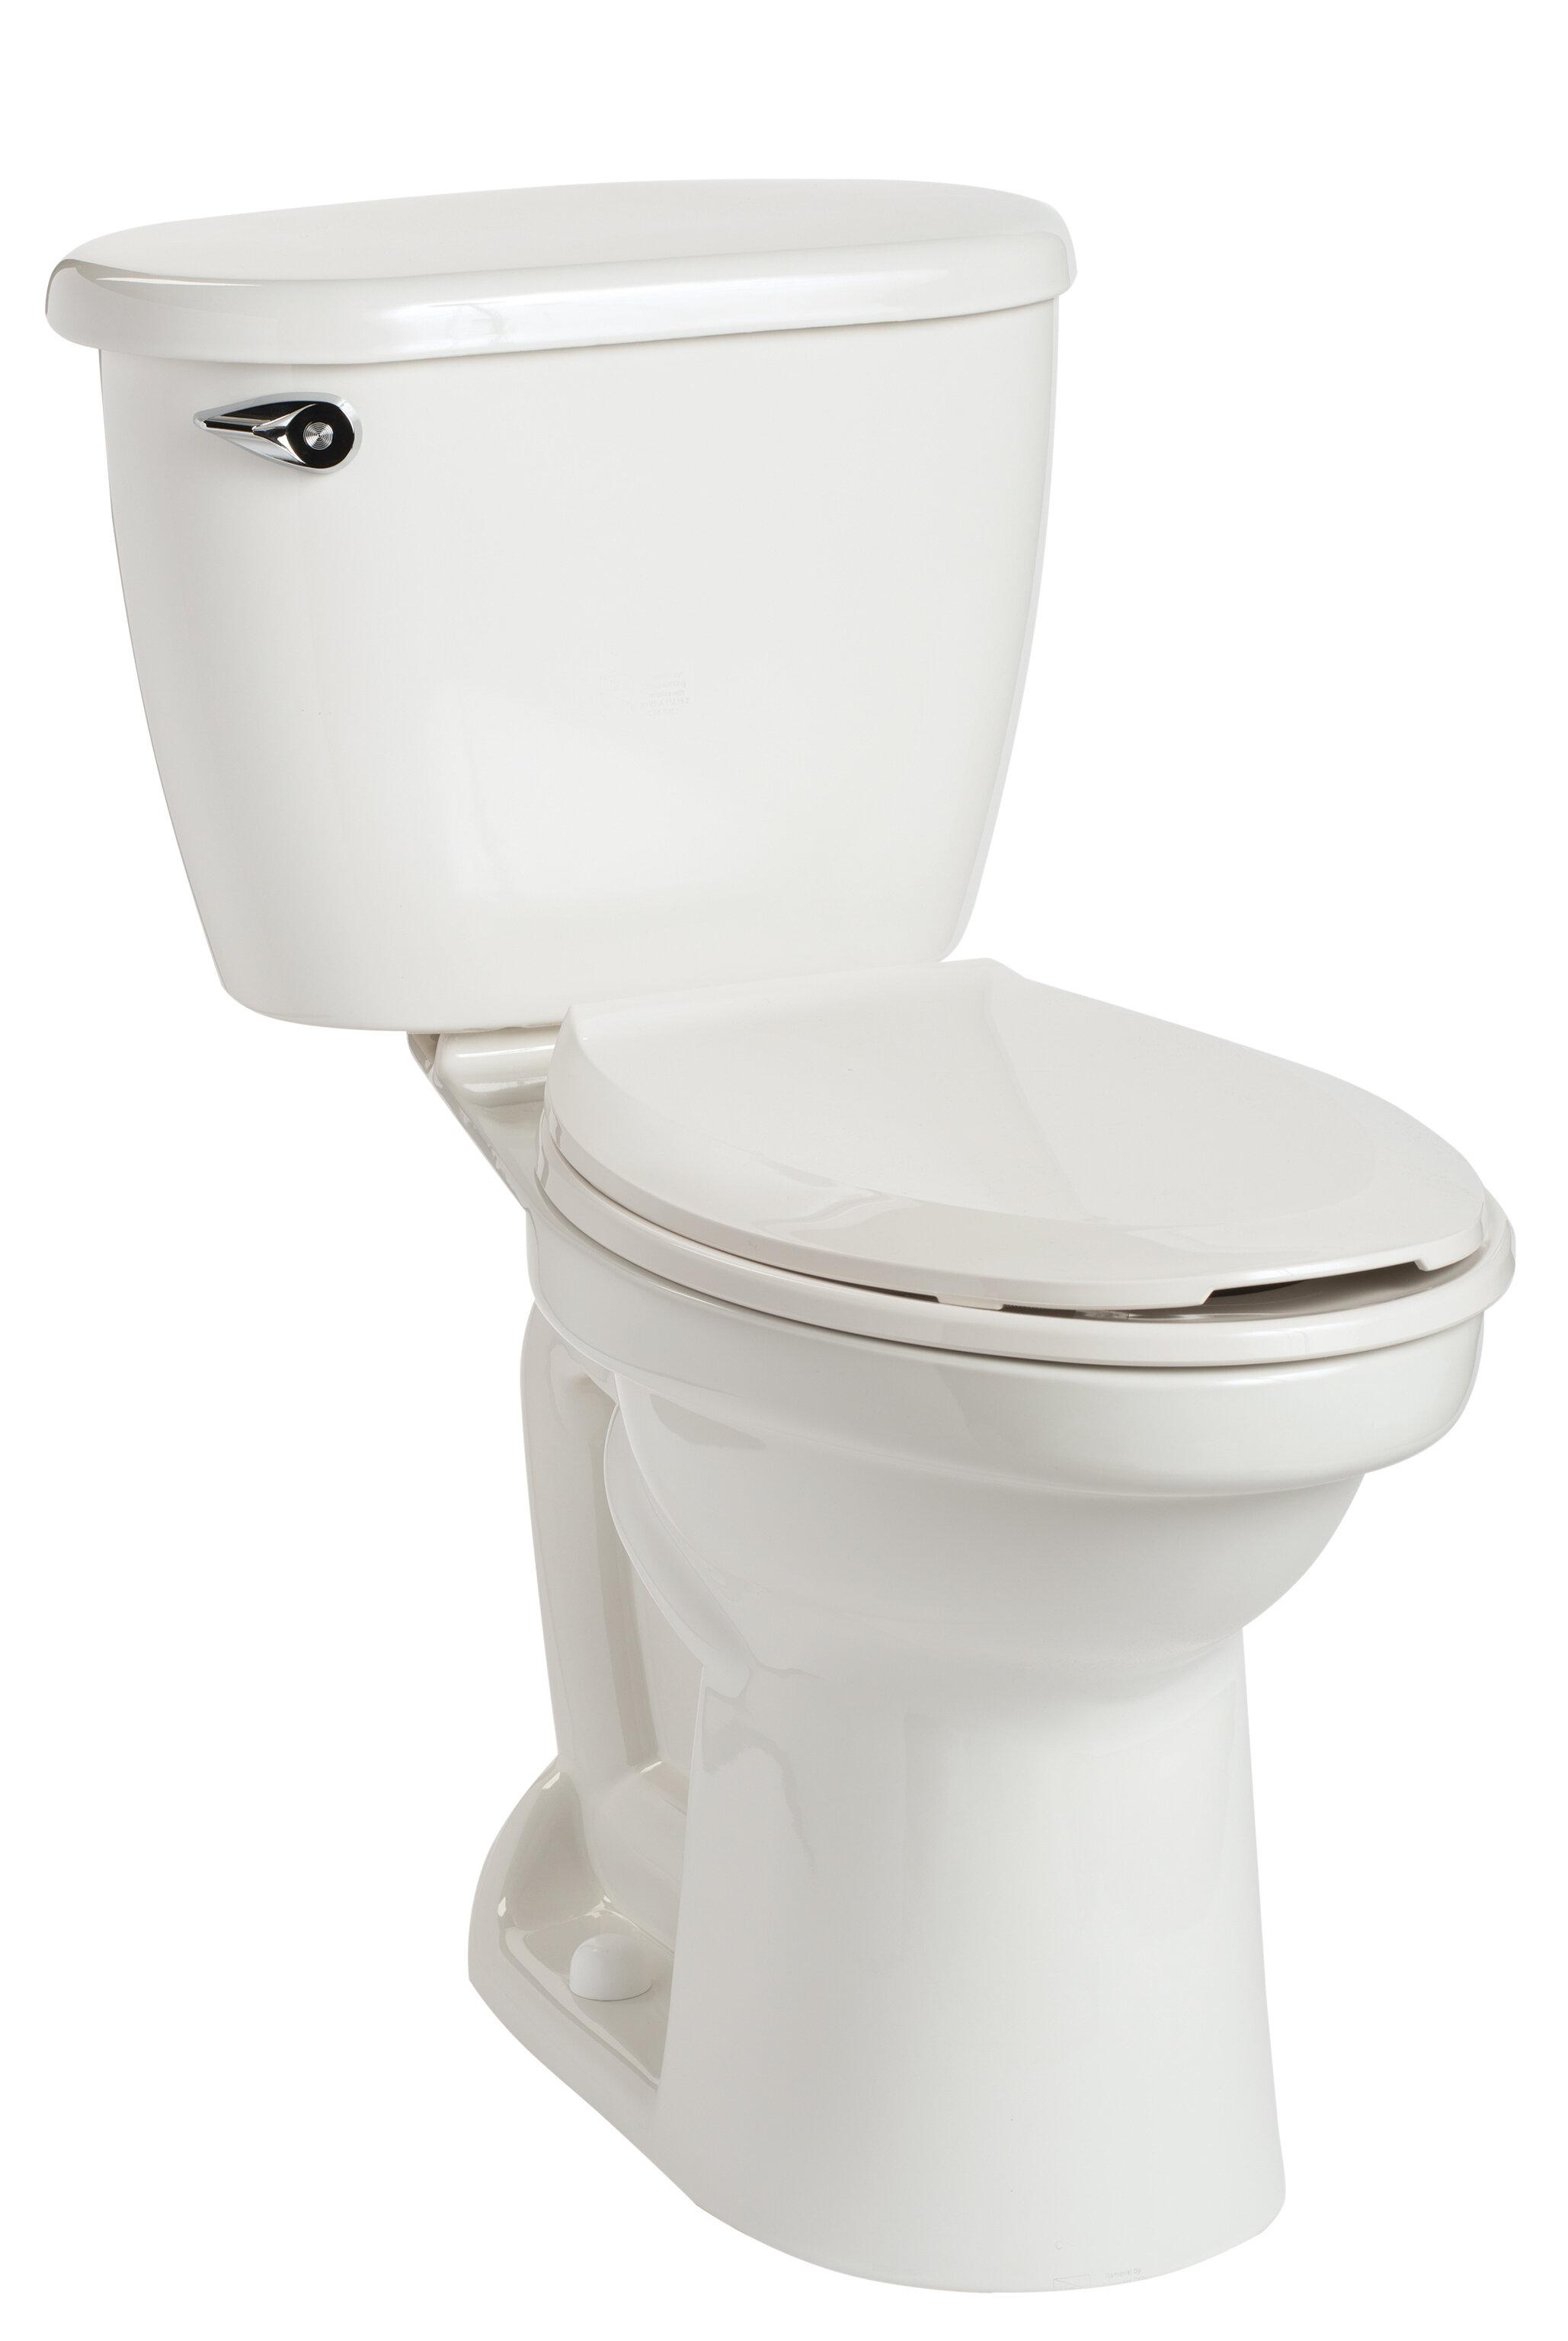 Tremendous Cascade Het Smartheight 1 28 Gpf Elongated Two Piece Toilet Seat Not Included Lamtechconsult Wood Chair Design Ideas Lamtechconsultcom